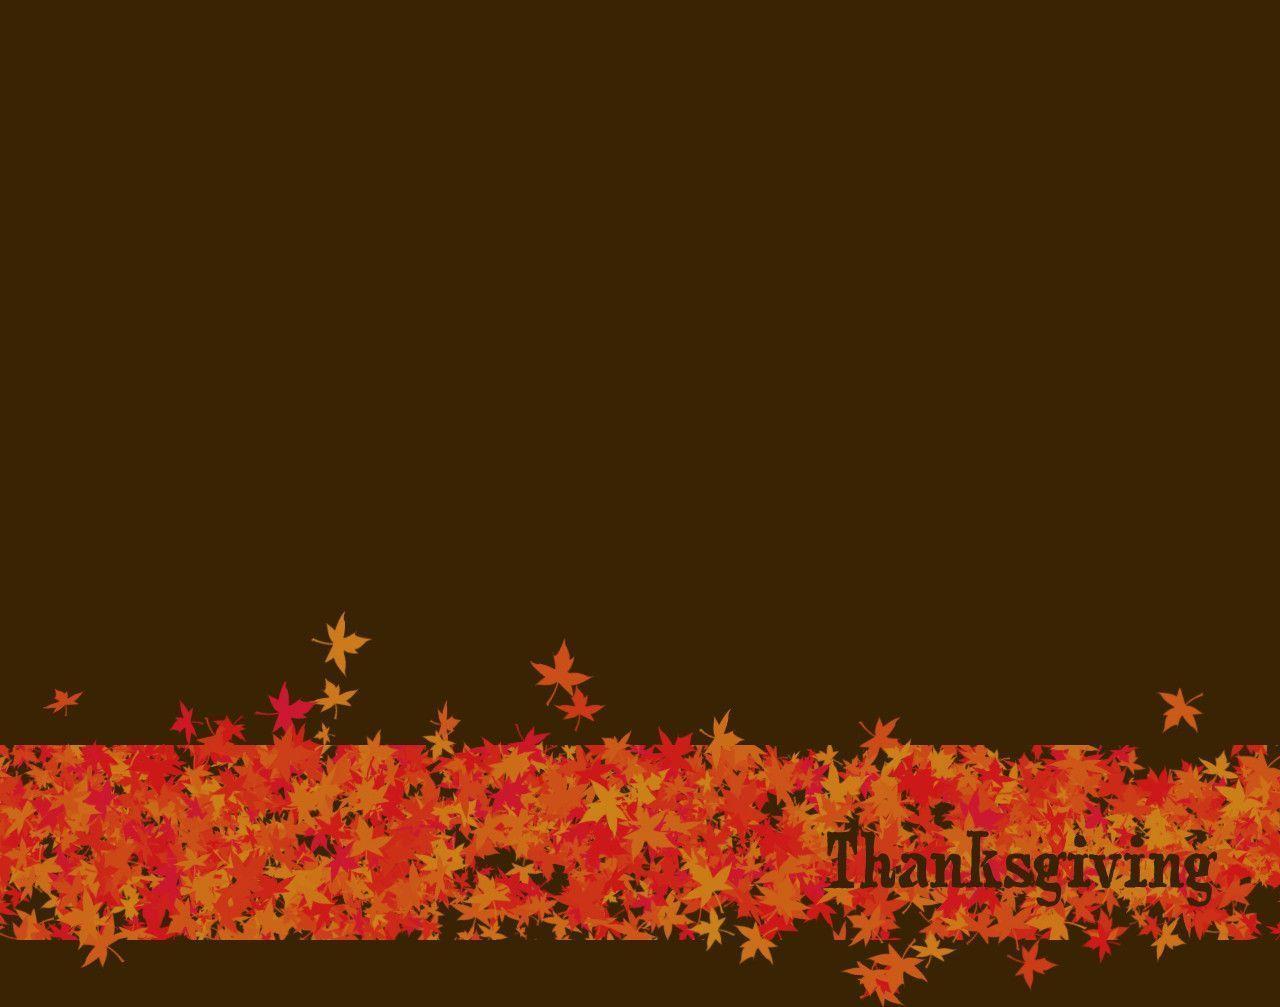 Thanksgiving Computer Wallpapers, Desktop Backgrounds 2560x1600 Id ...